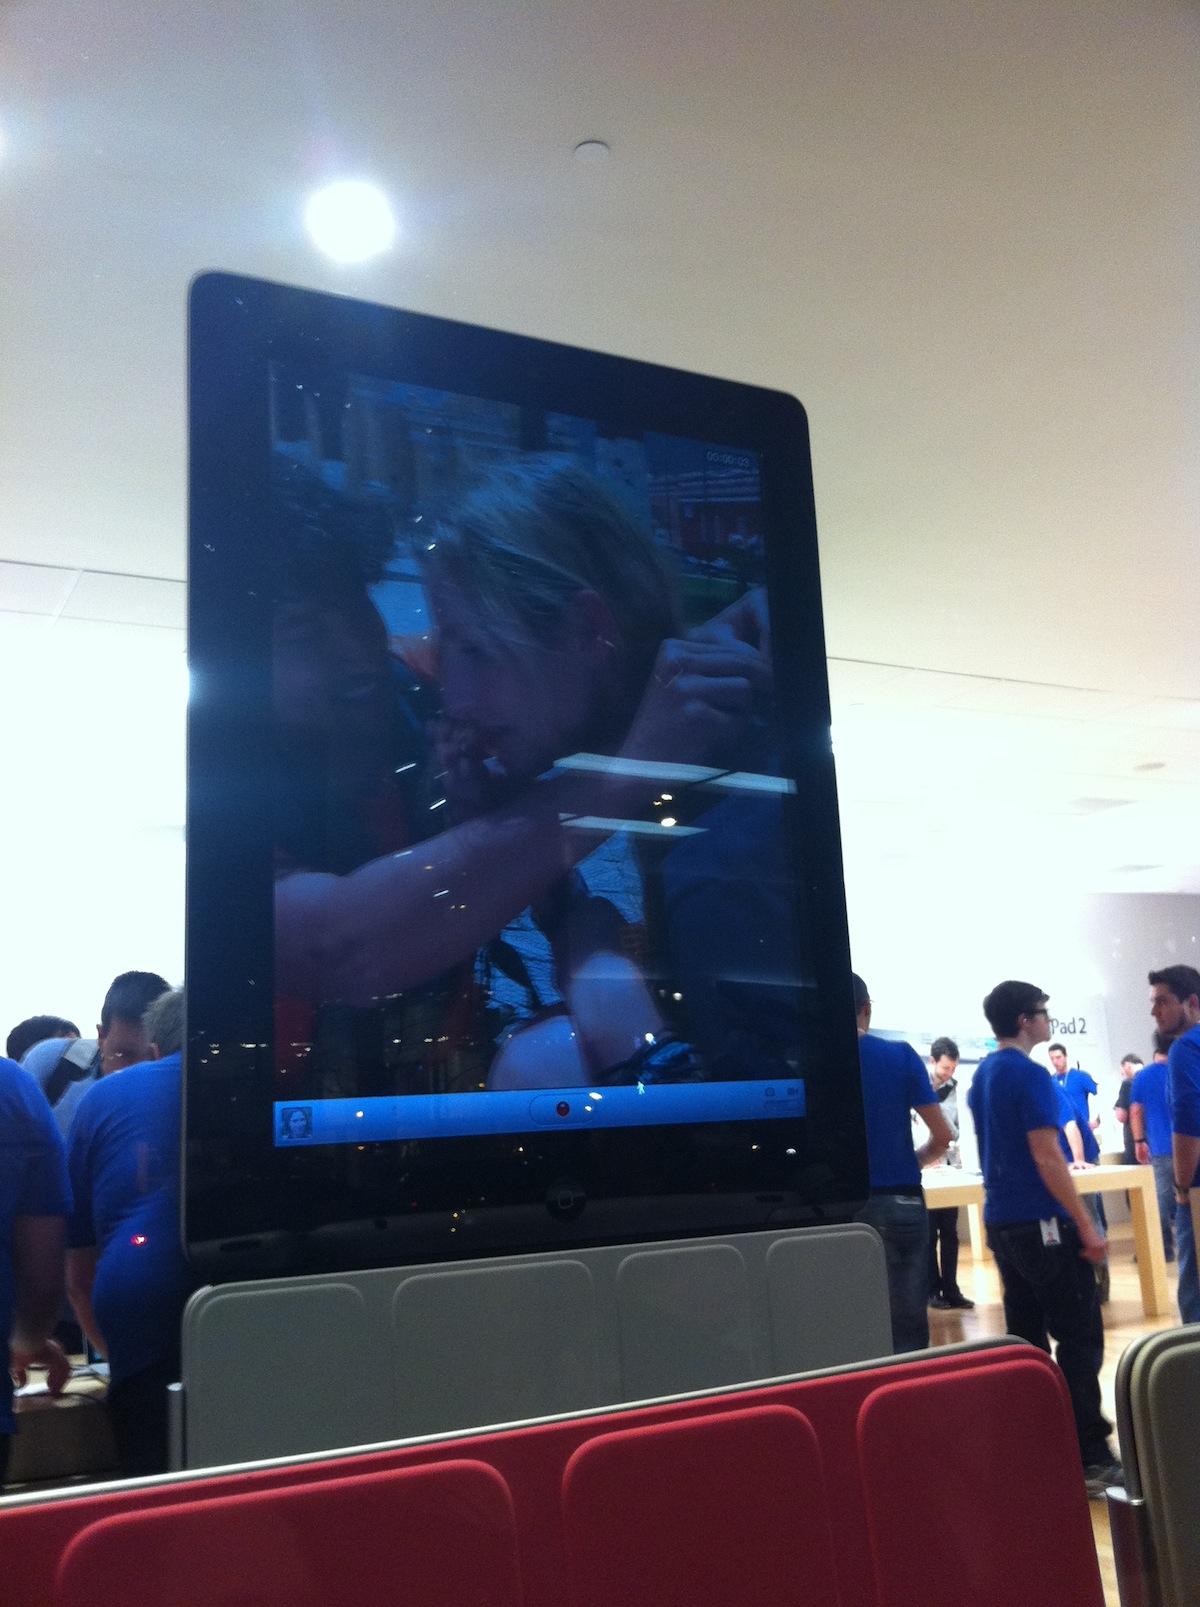 iPad 2 store shelf